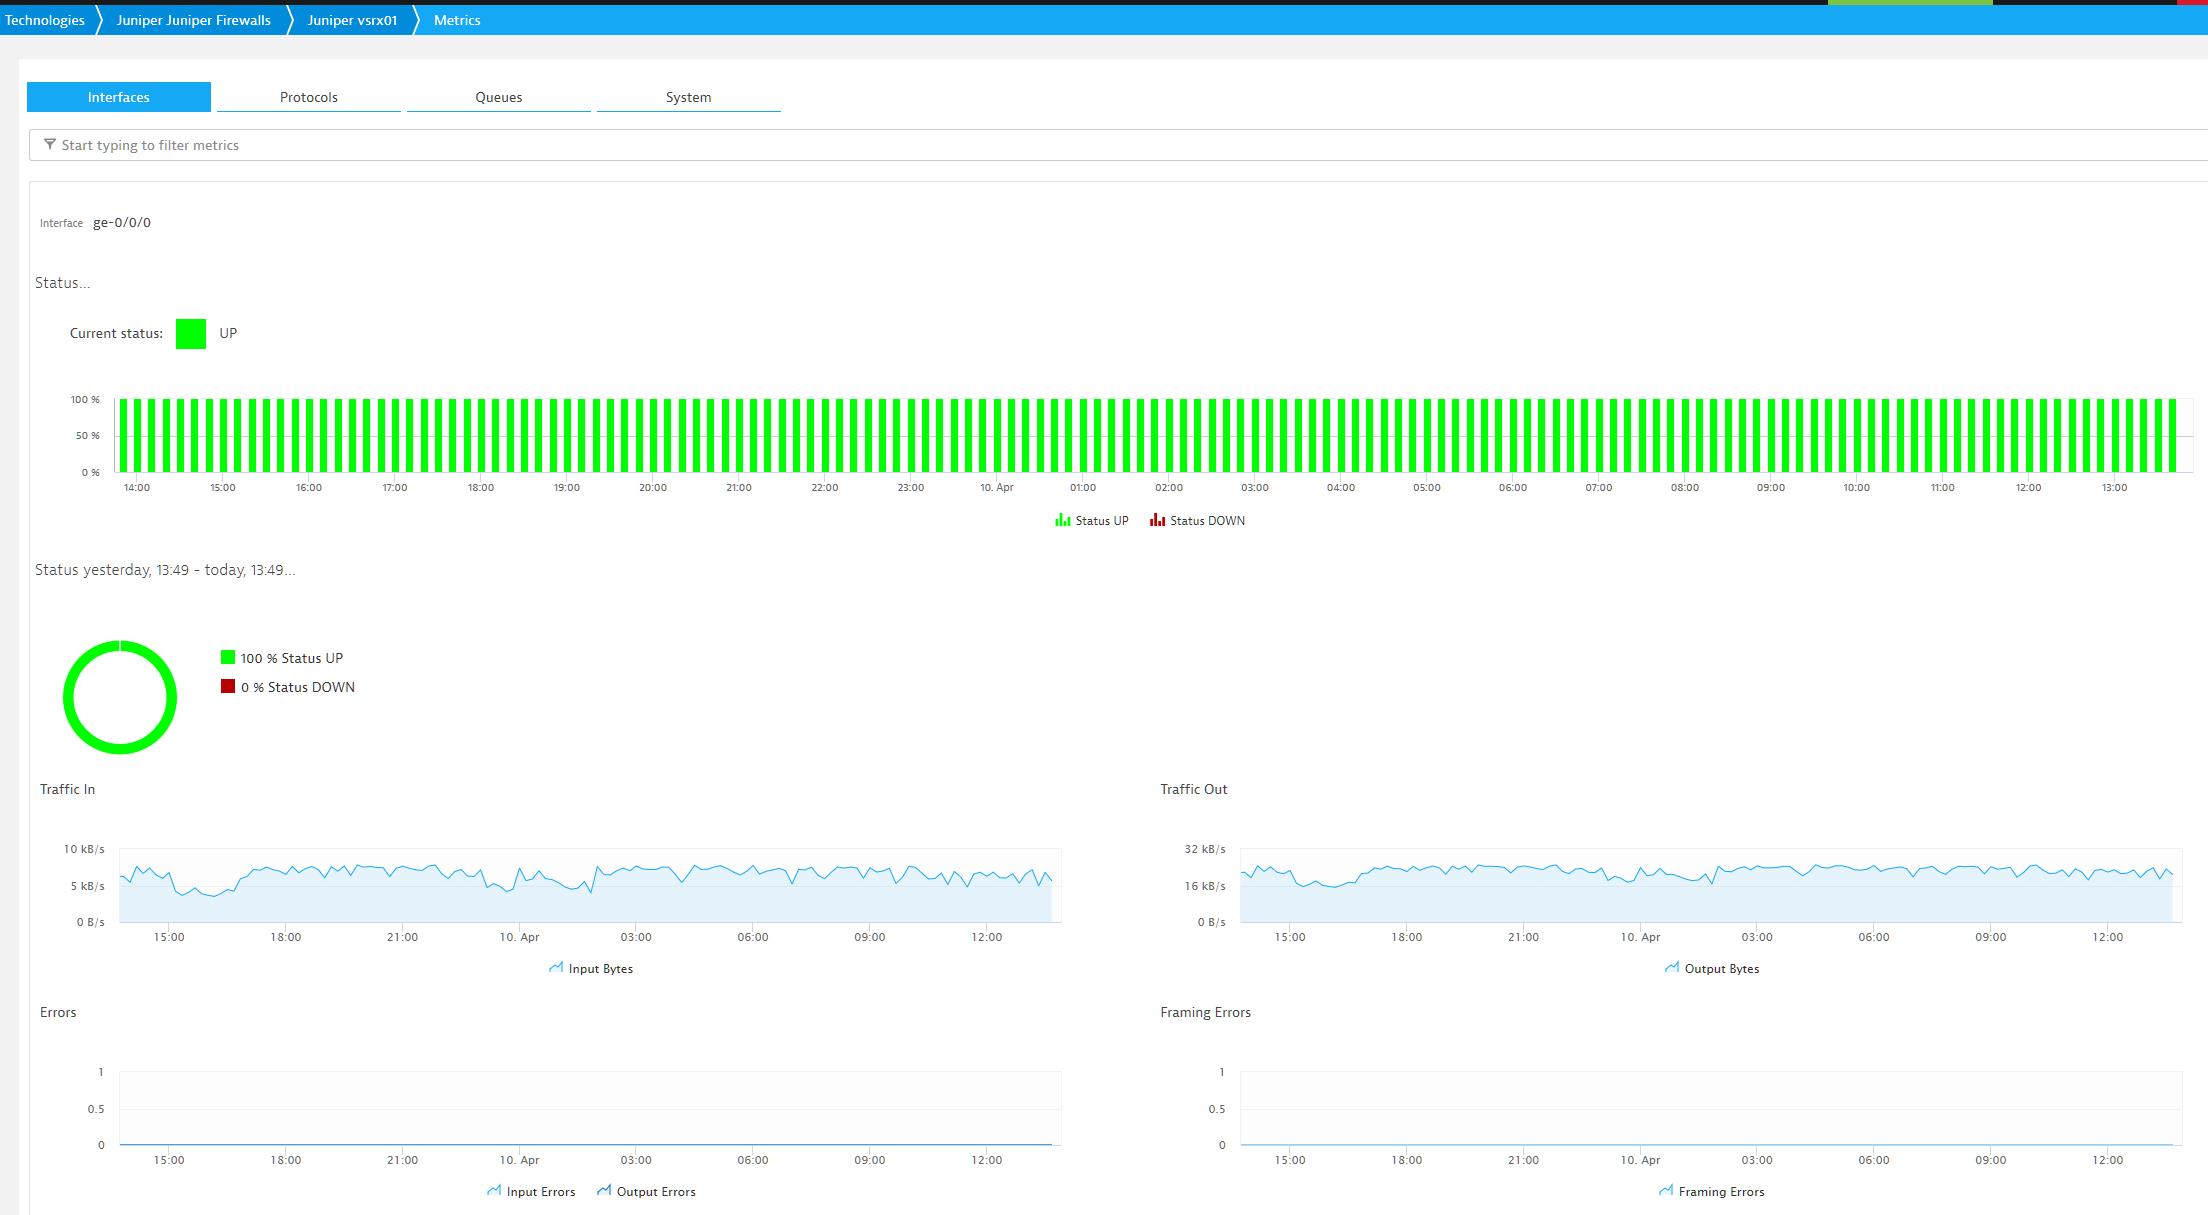 Juniper firewall metrics